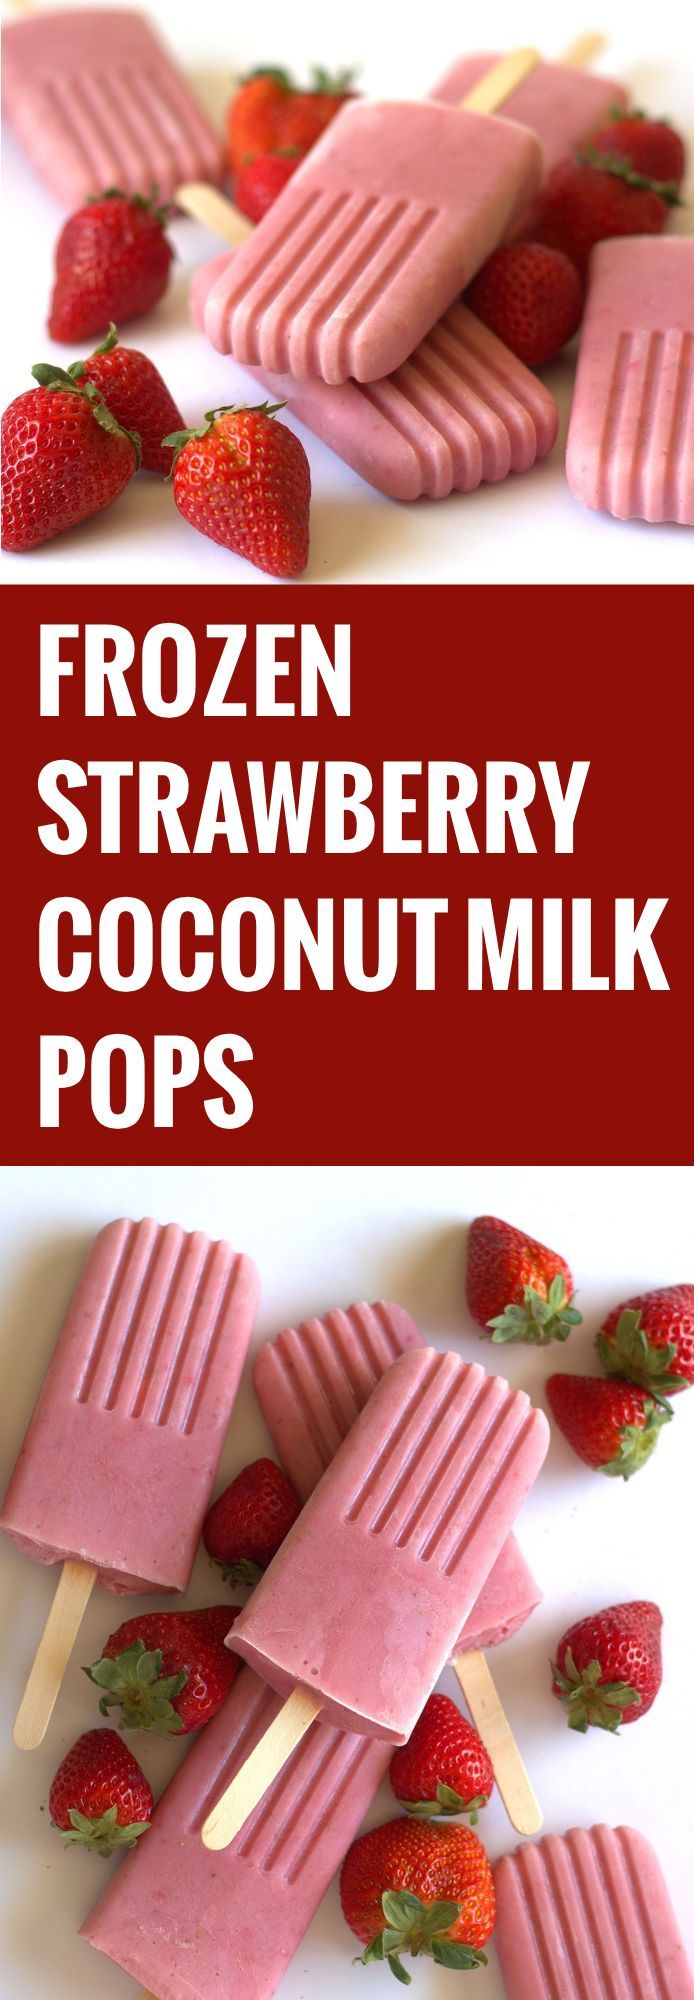 Strawberry Coconut Milk Pops